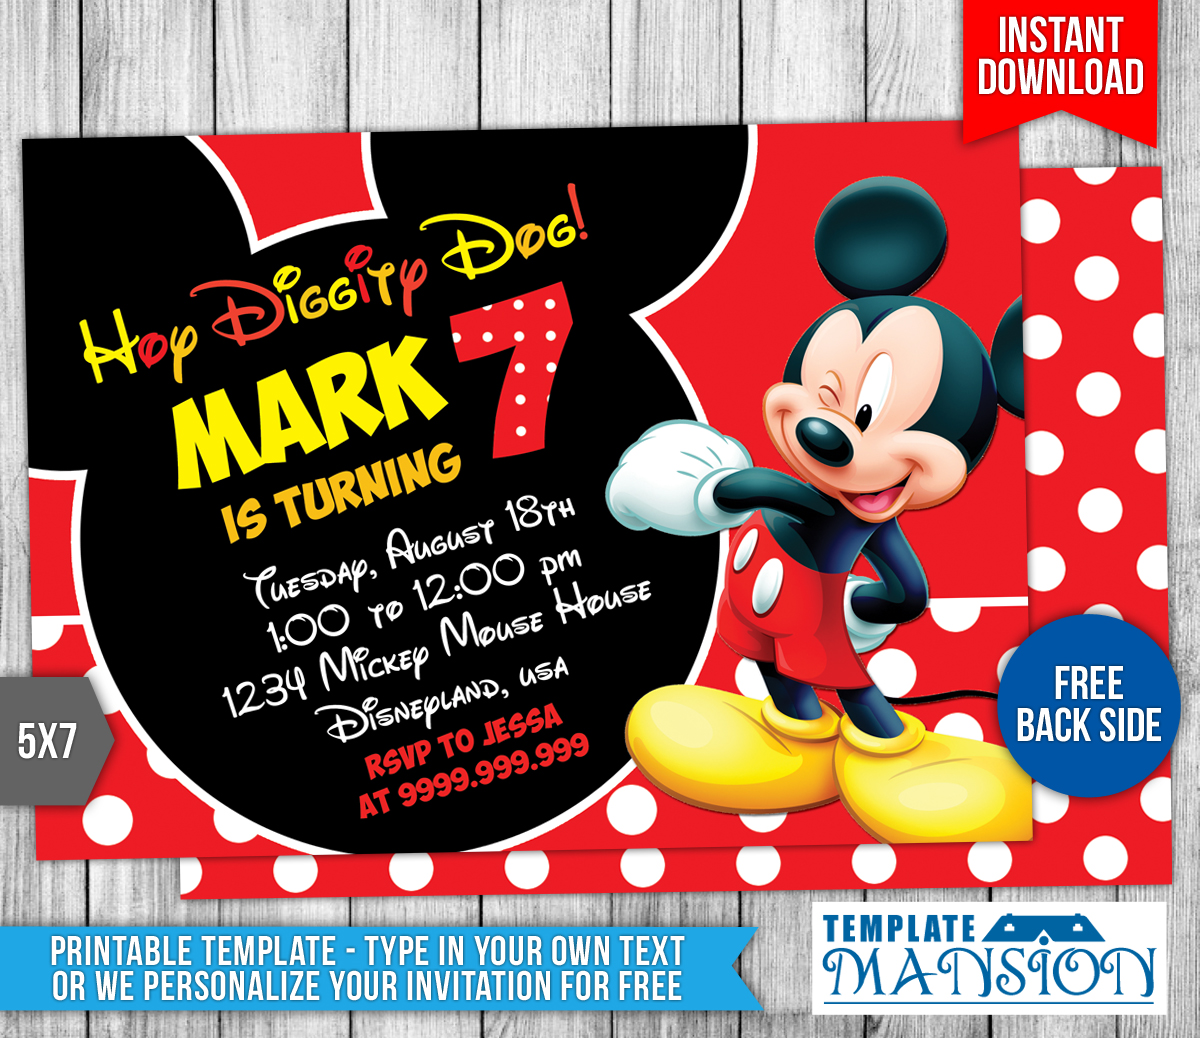 Mickey mouse birthday invitation 4 by templatemansion on deviantart mickey mouse birthday invitation 4 by templatemansion filmwisefo